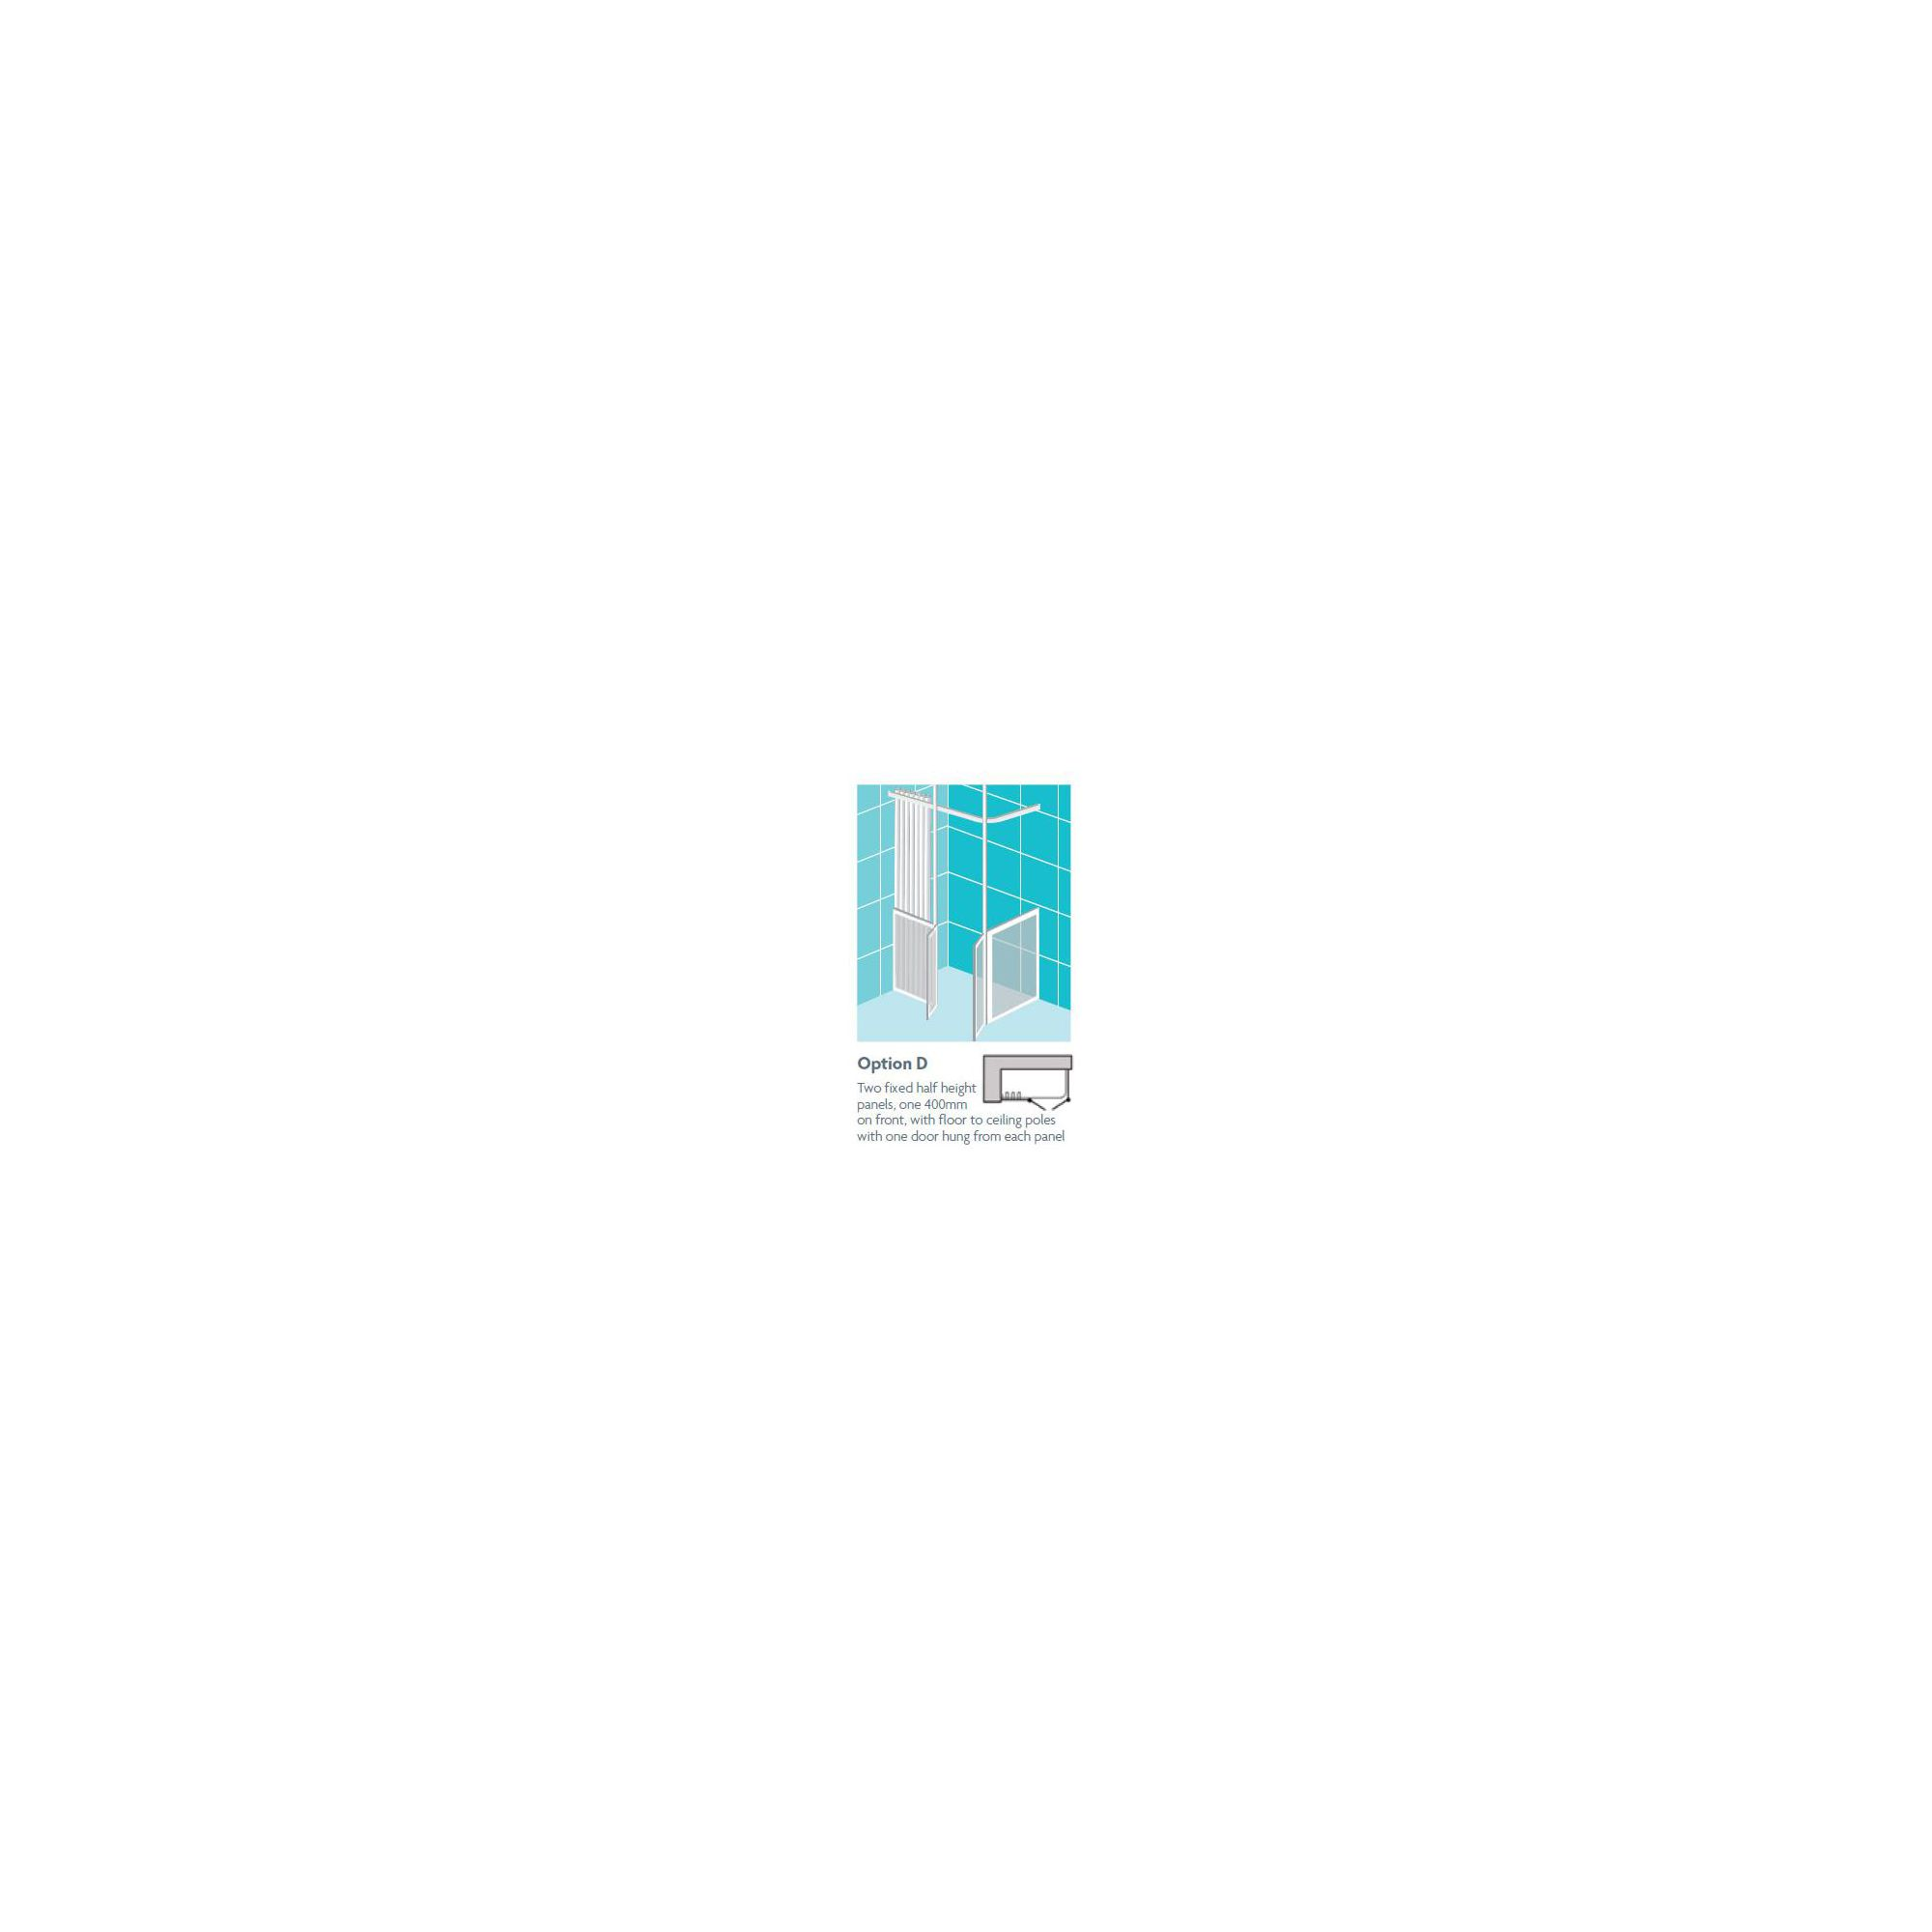 Impey Supreme Corner Door Option D Left Hand 1500mm x 750mm at Tesco Direct